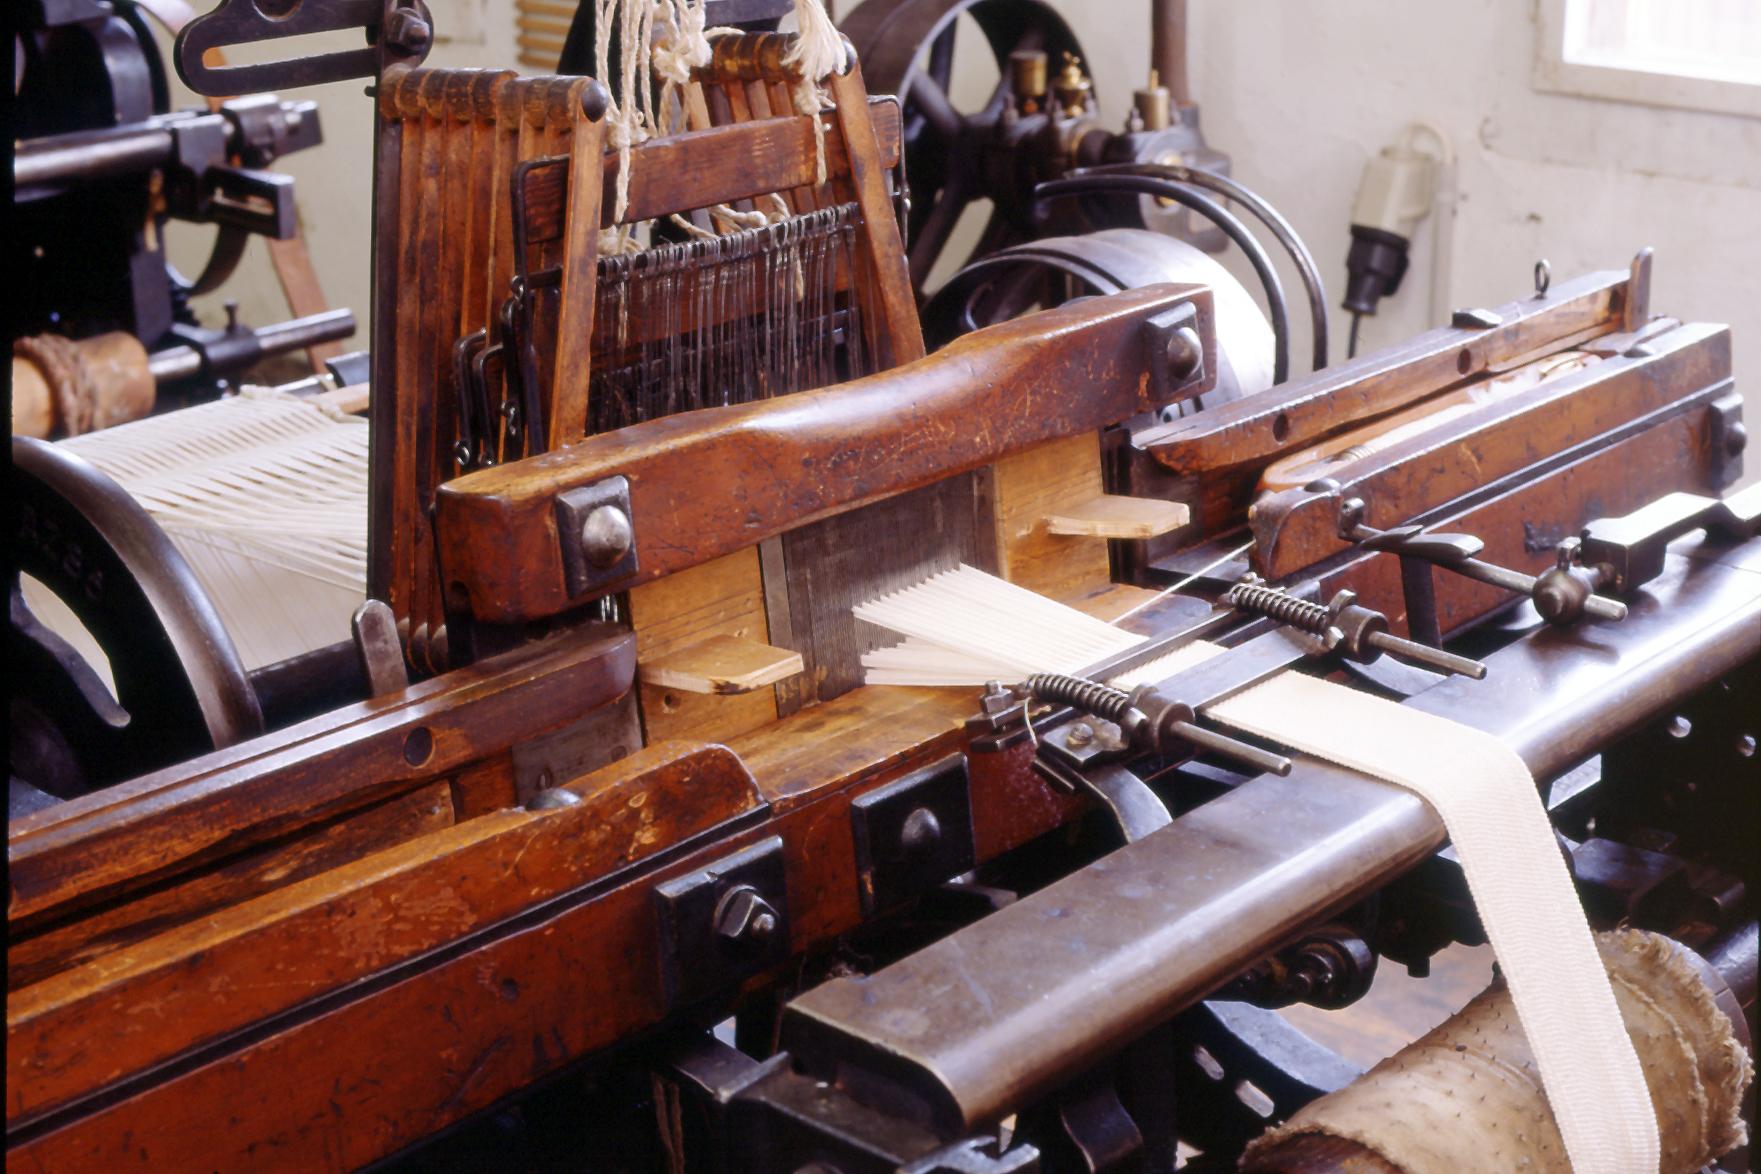 Textilmanufakturort & Industrielehrpfad, Hauptwil